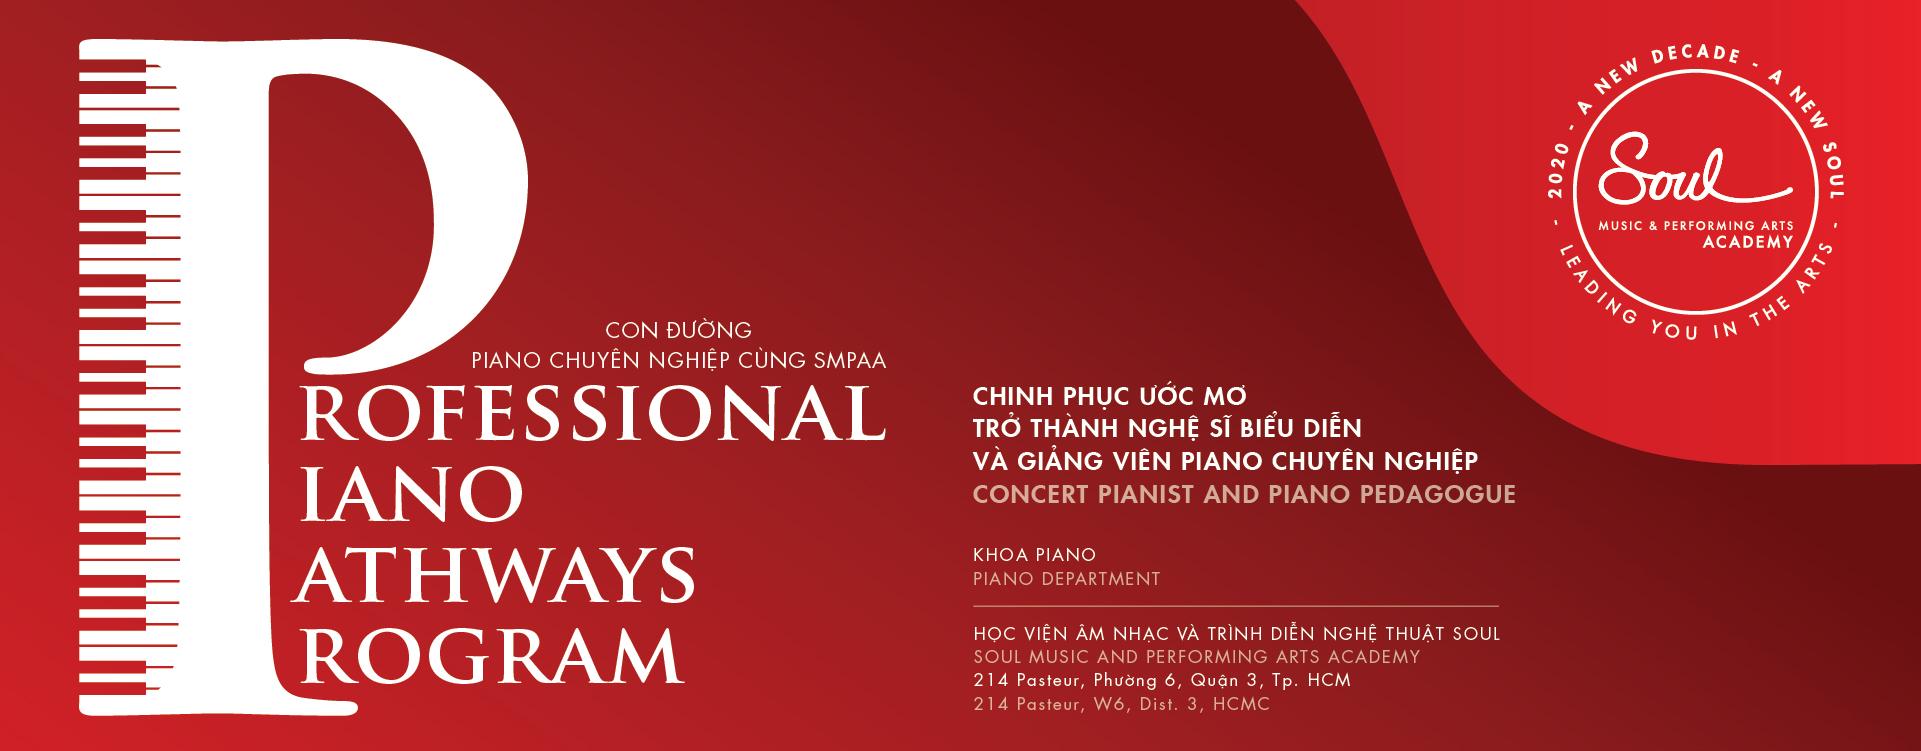 Instructor of Piano - Professional Piano Pathways Program